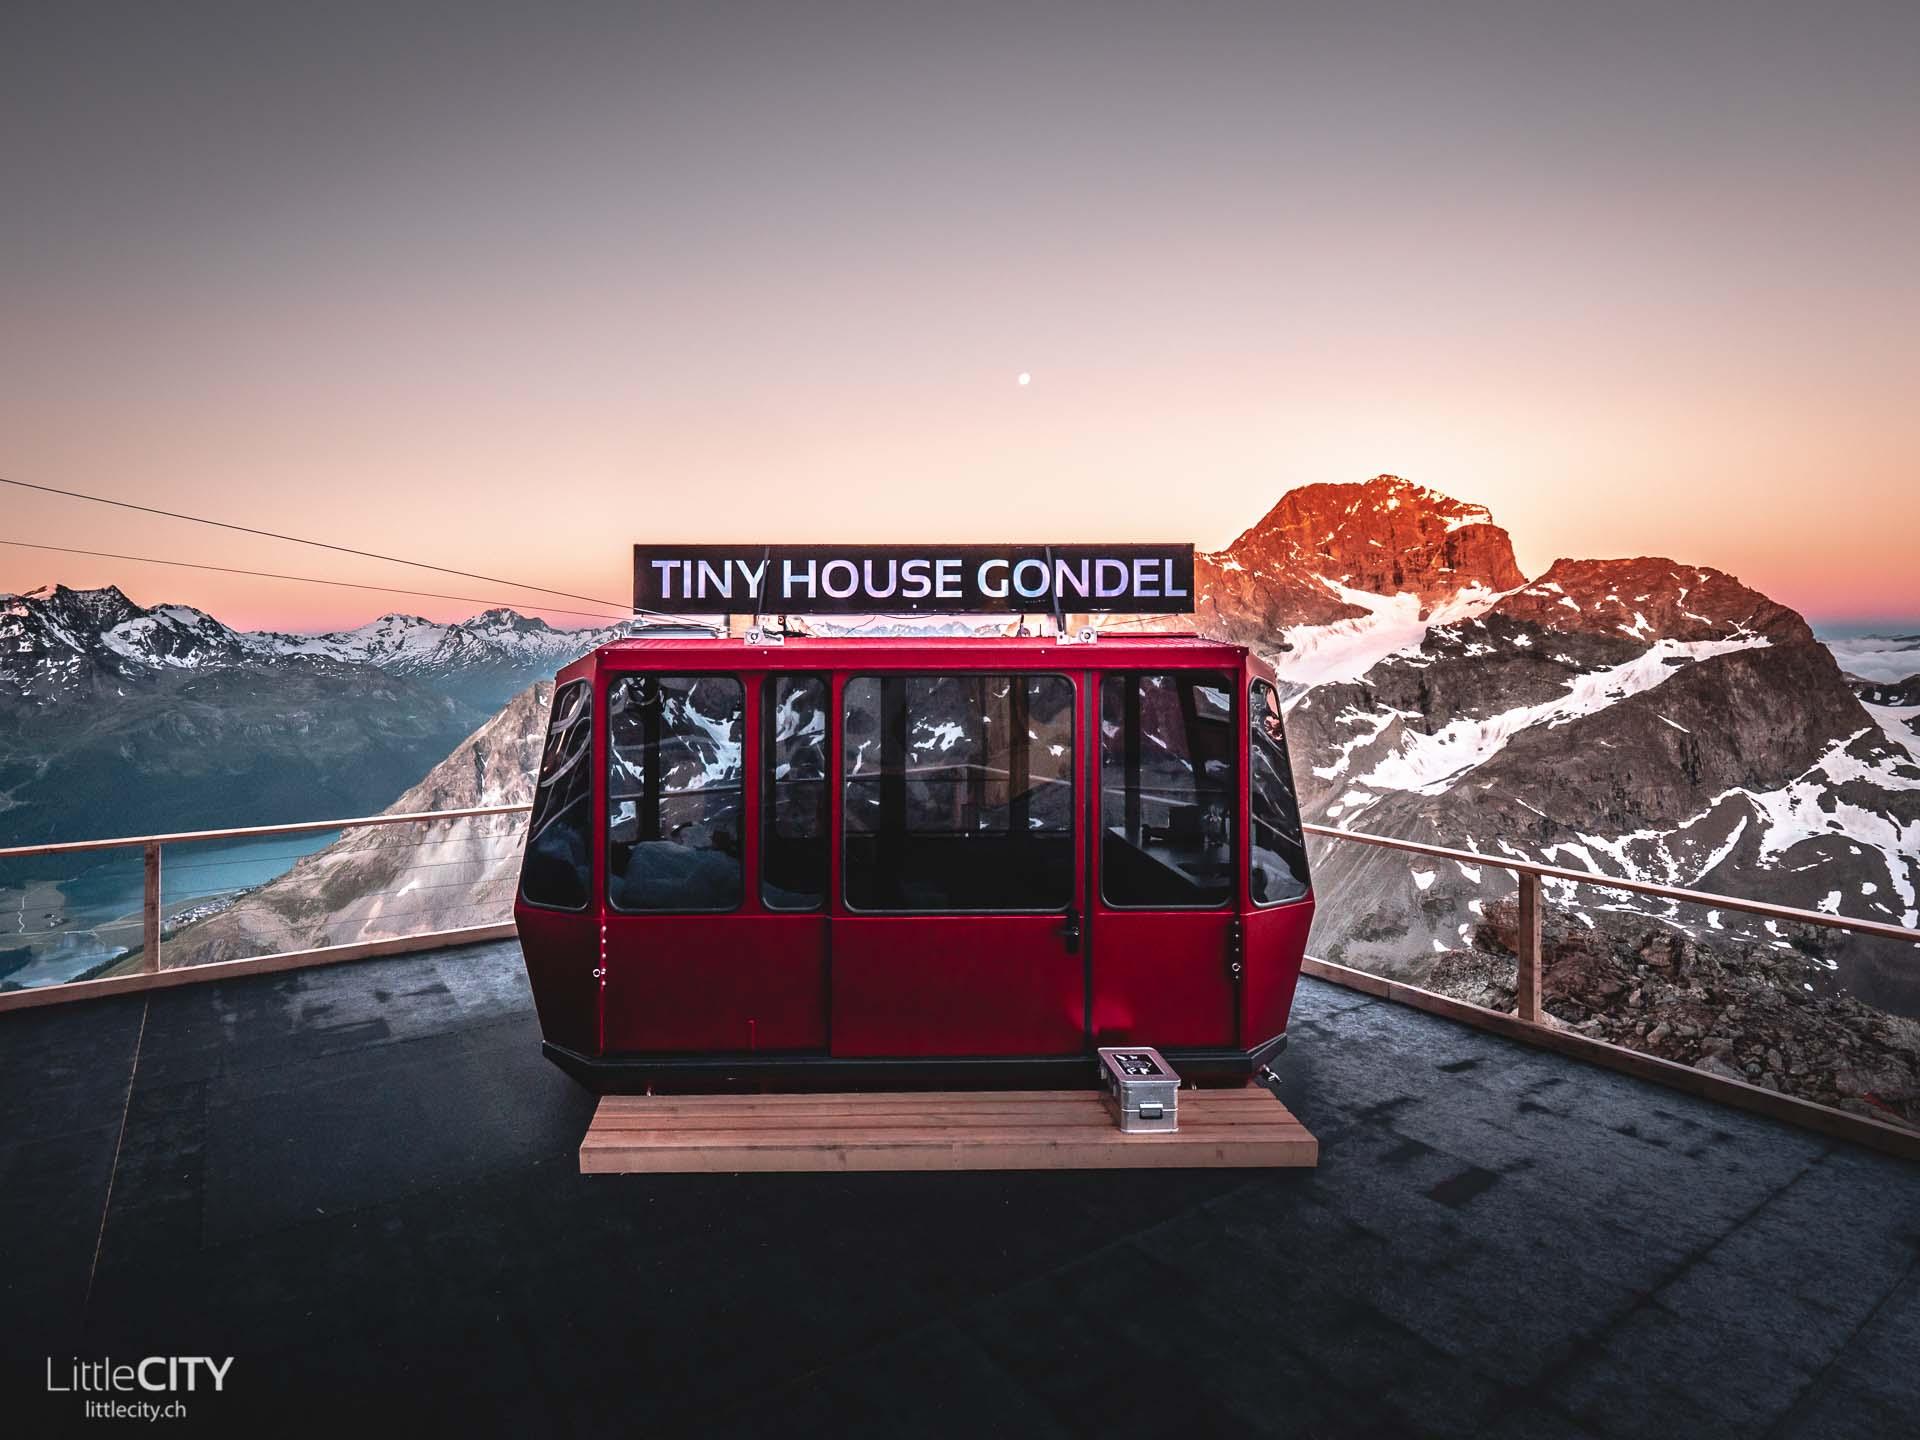 Tiny House Gondel Piz Nair